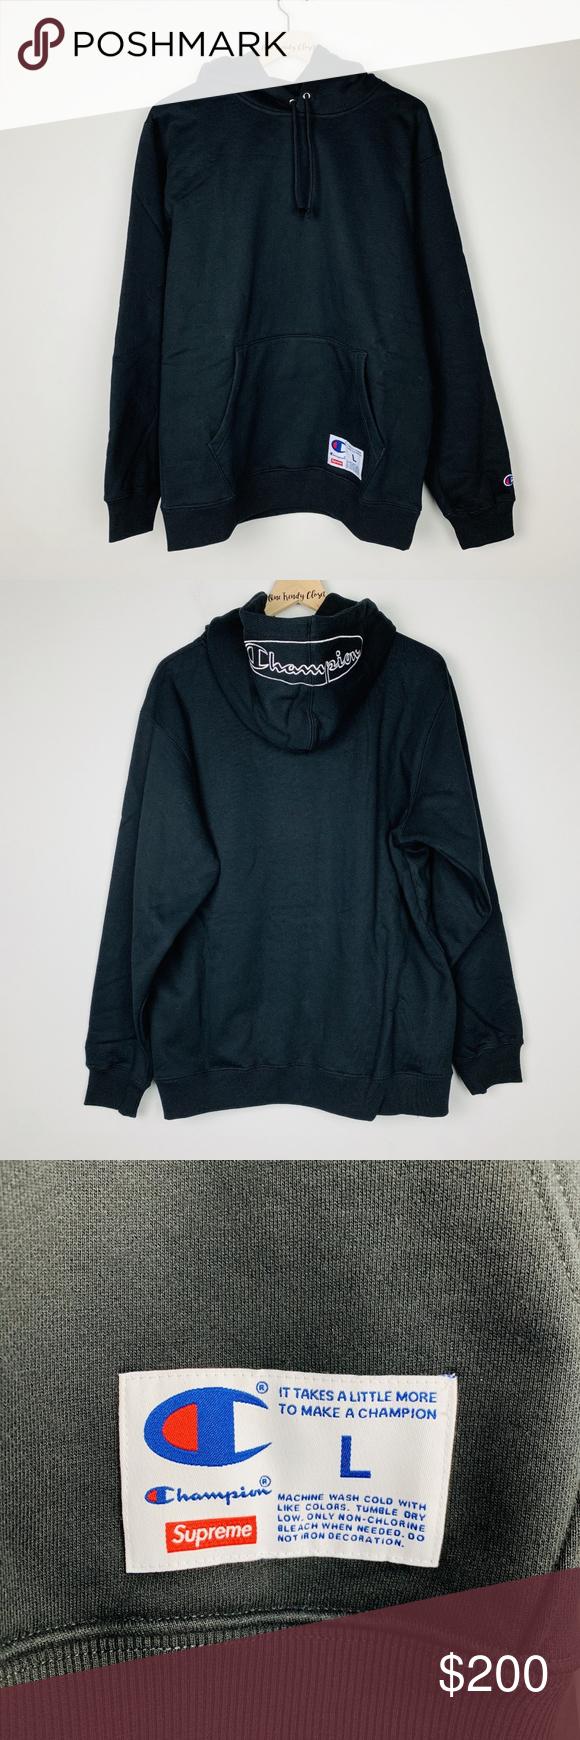 Supreme Men S Champion Outline Hooded Sweatshirt Hoodie Brands Hooded Sweatshirts Black Sweatshirts [ 1740 x 580 Pixel ]